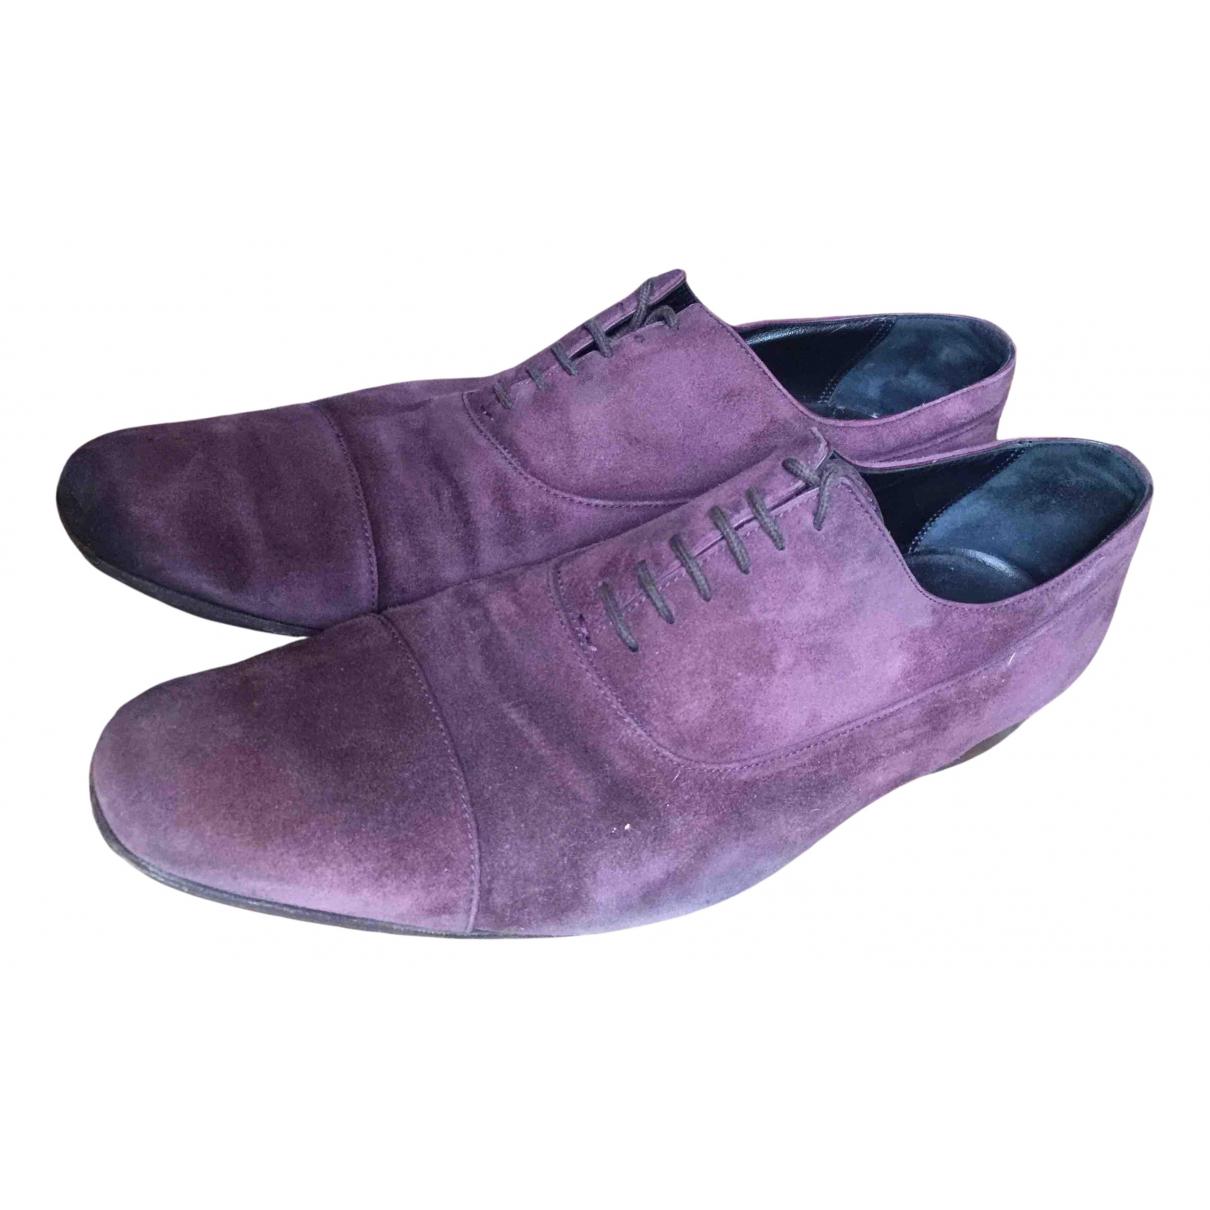 Hermes - Derbies   pour homme en cuir - violet